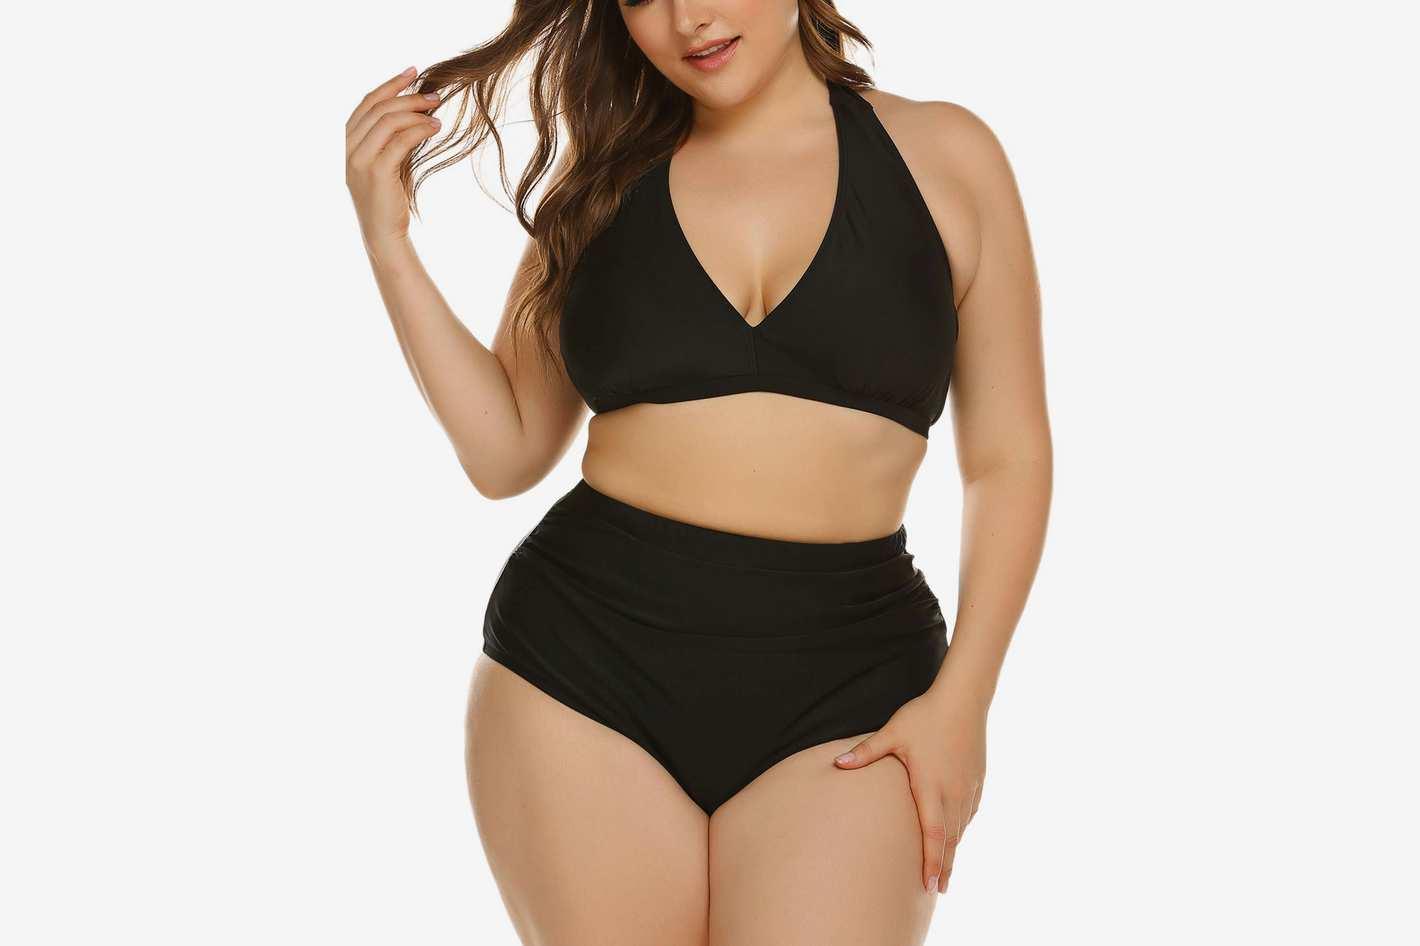 IN'VOLAND Plus Size High Waisted Halter Vintage Bikini Set